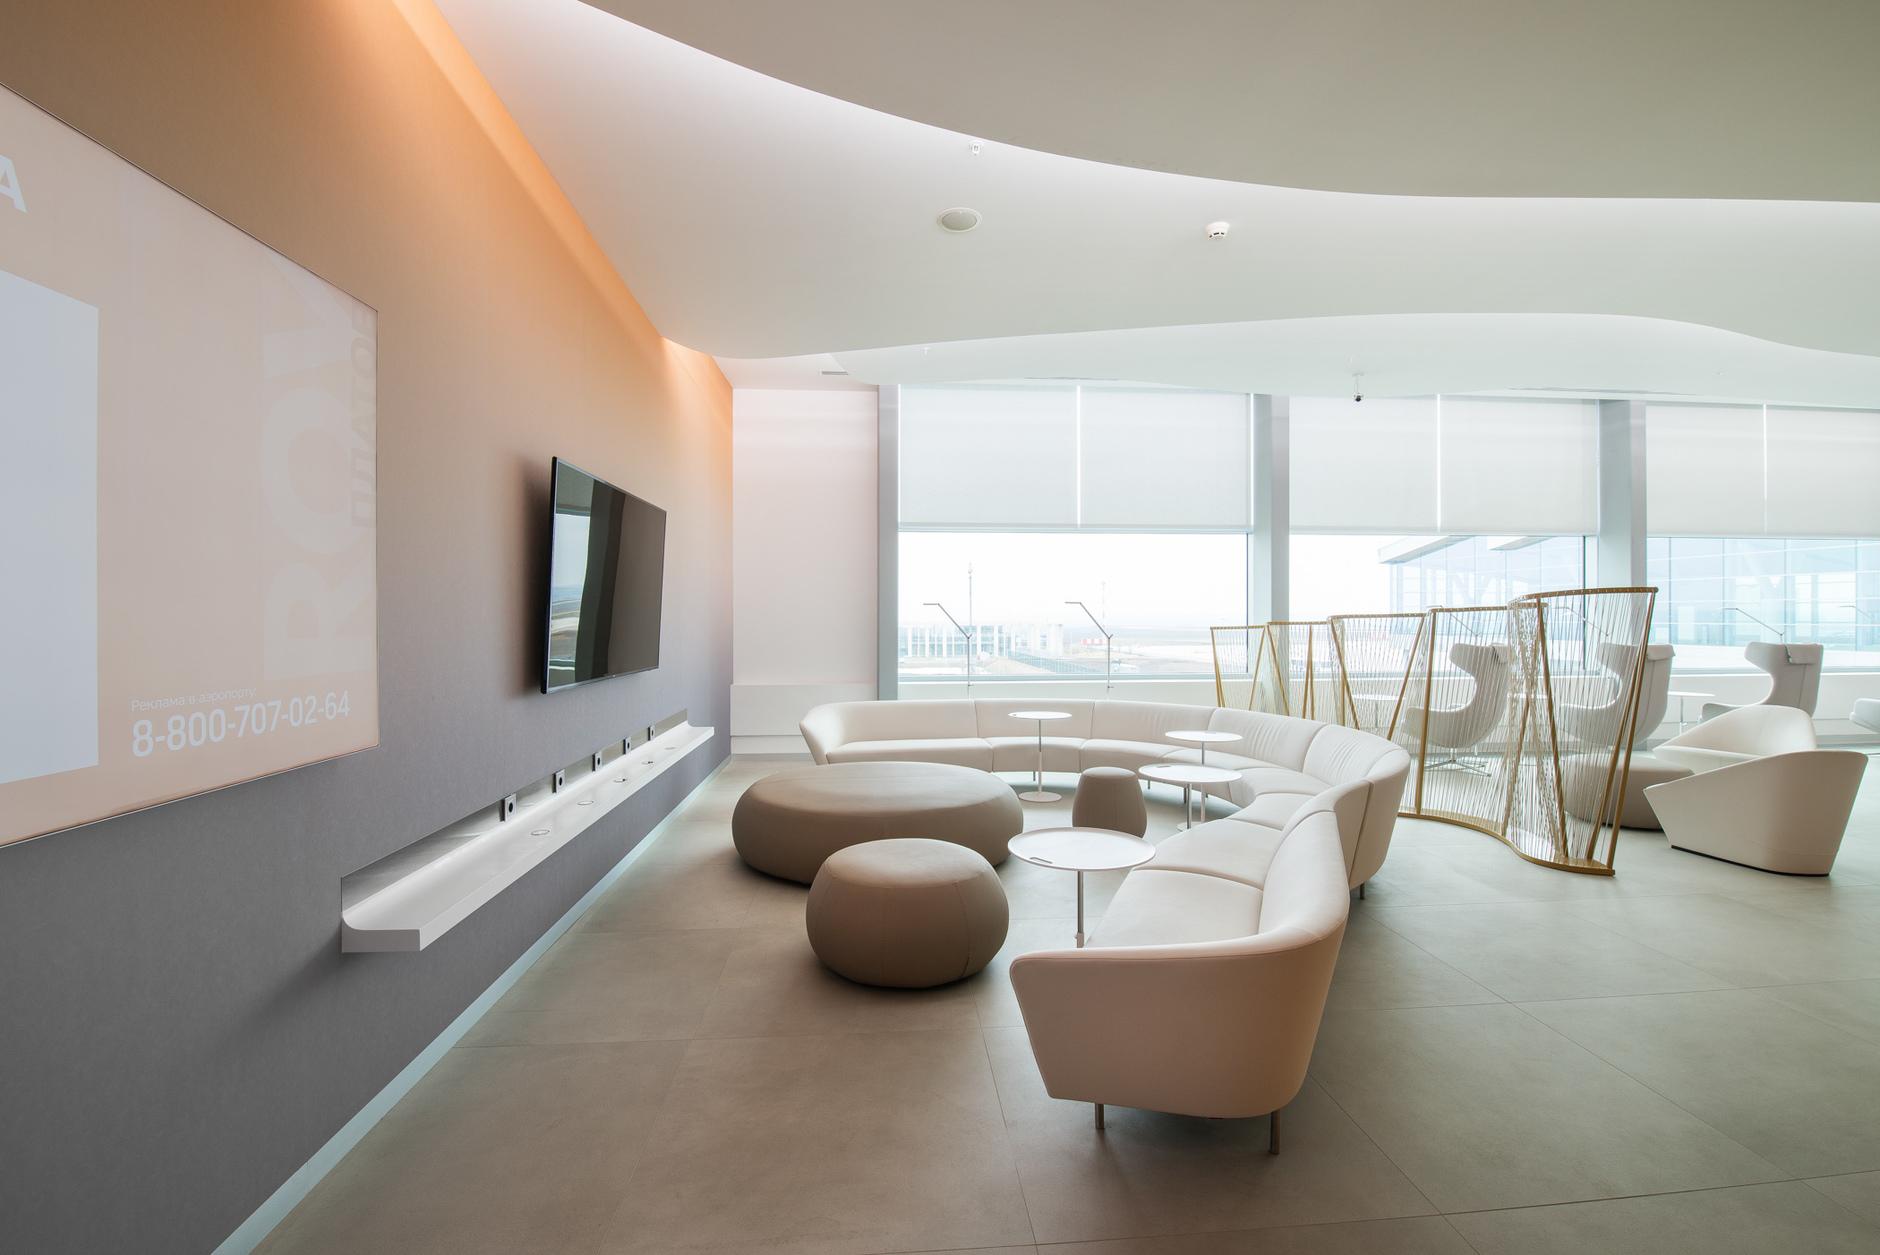 Бизнес-лаунж аэропорта «Платов» в Ростове-на-Дону: проект VOX Architects (галерея 9, фото 3)